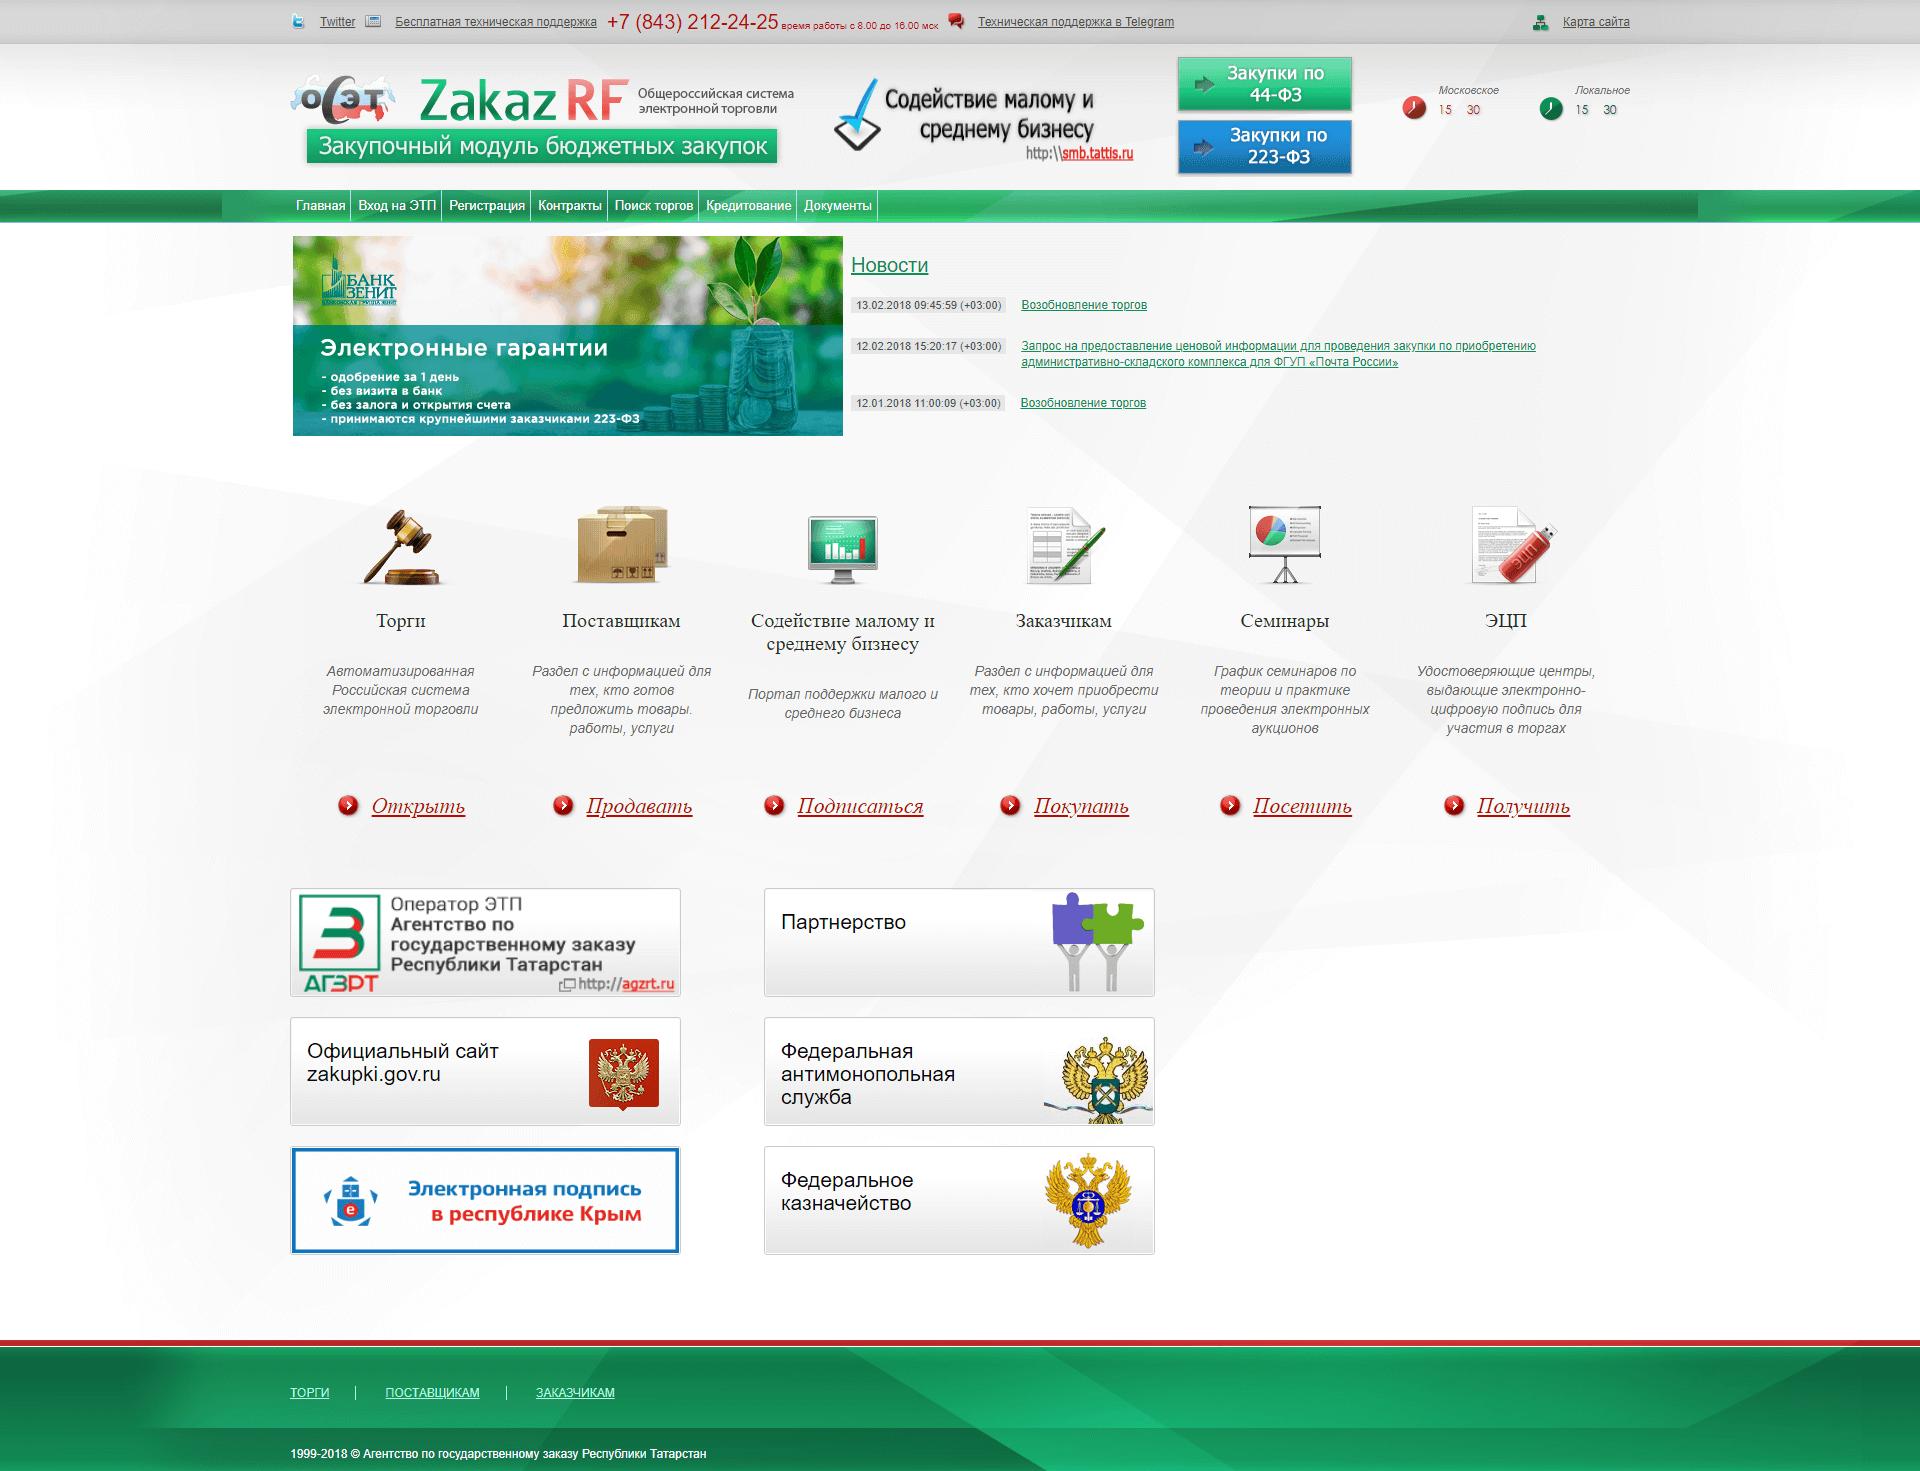 Сайт zakazrf.ru